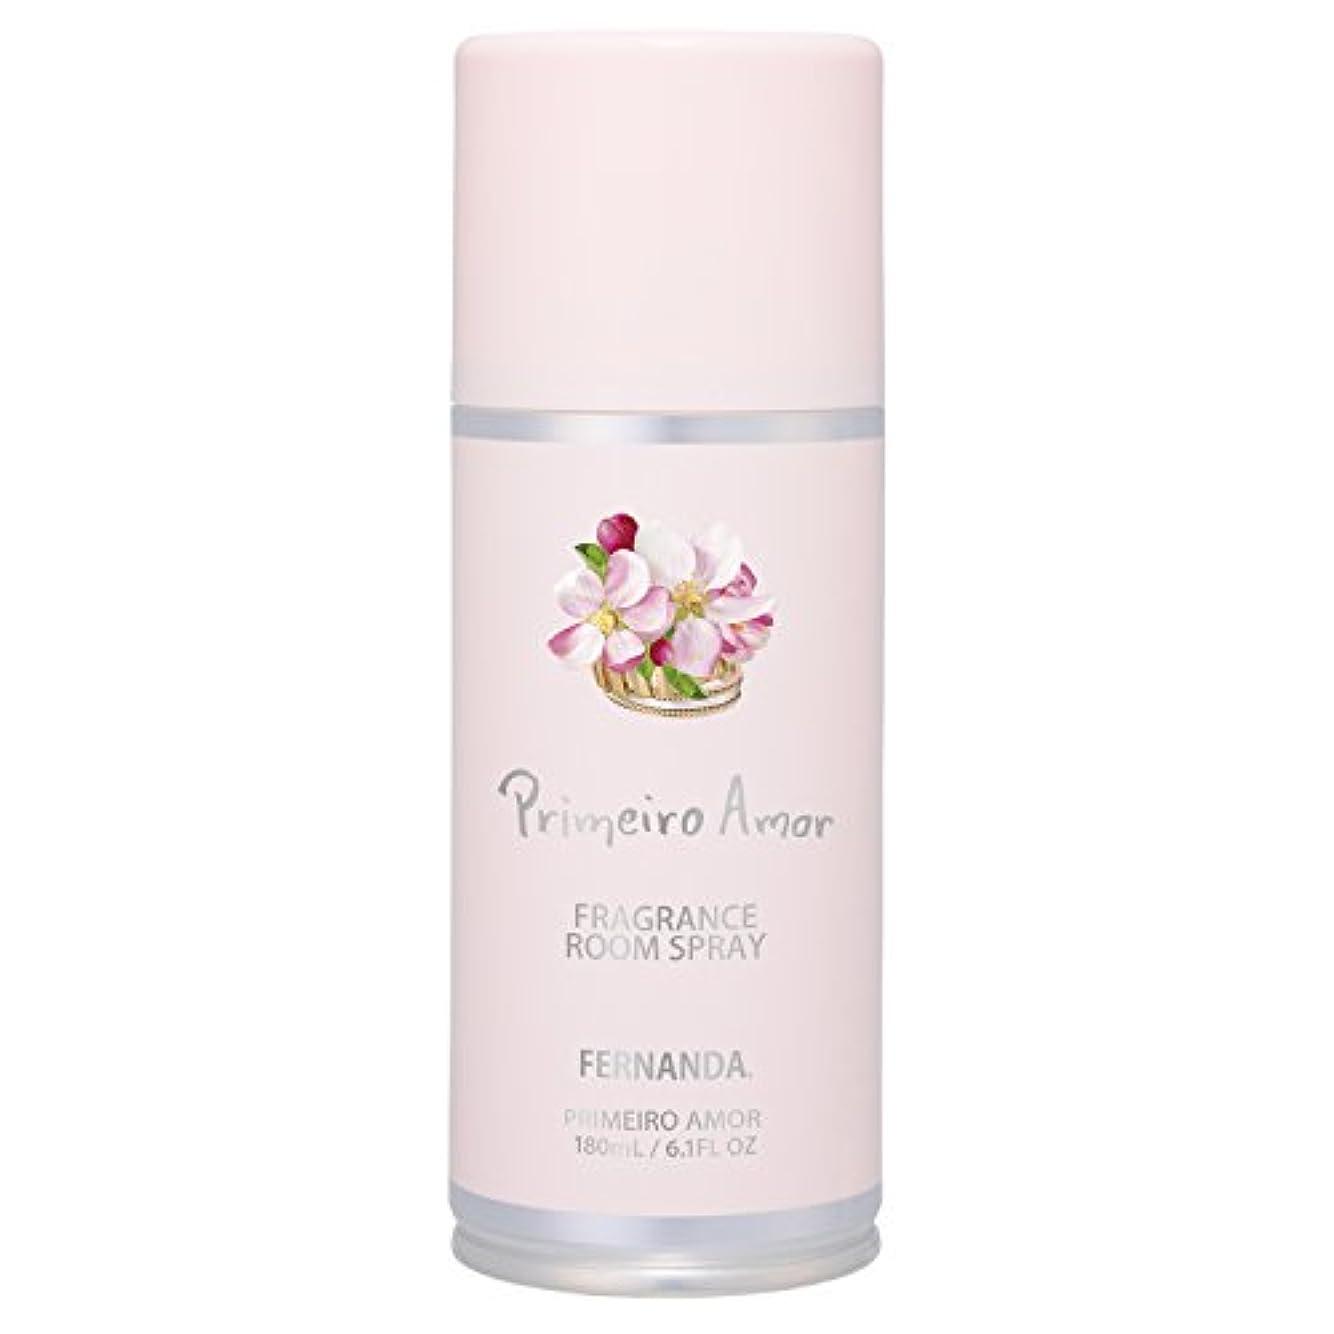 FERNANDA(フェルナンダ) Room Spray Primeiro Amor(ルームスプレー プリメイロアモール)